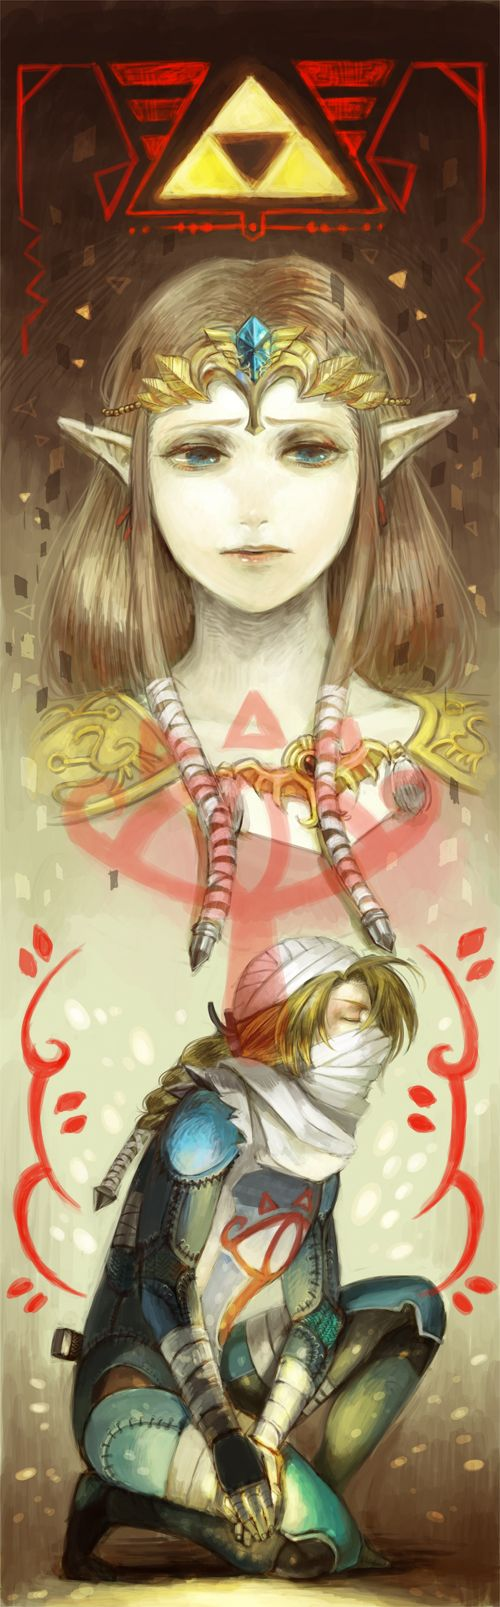 Princess Zelda & Sheik art- Legend of Zelda: Ocarina of Time